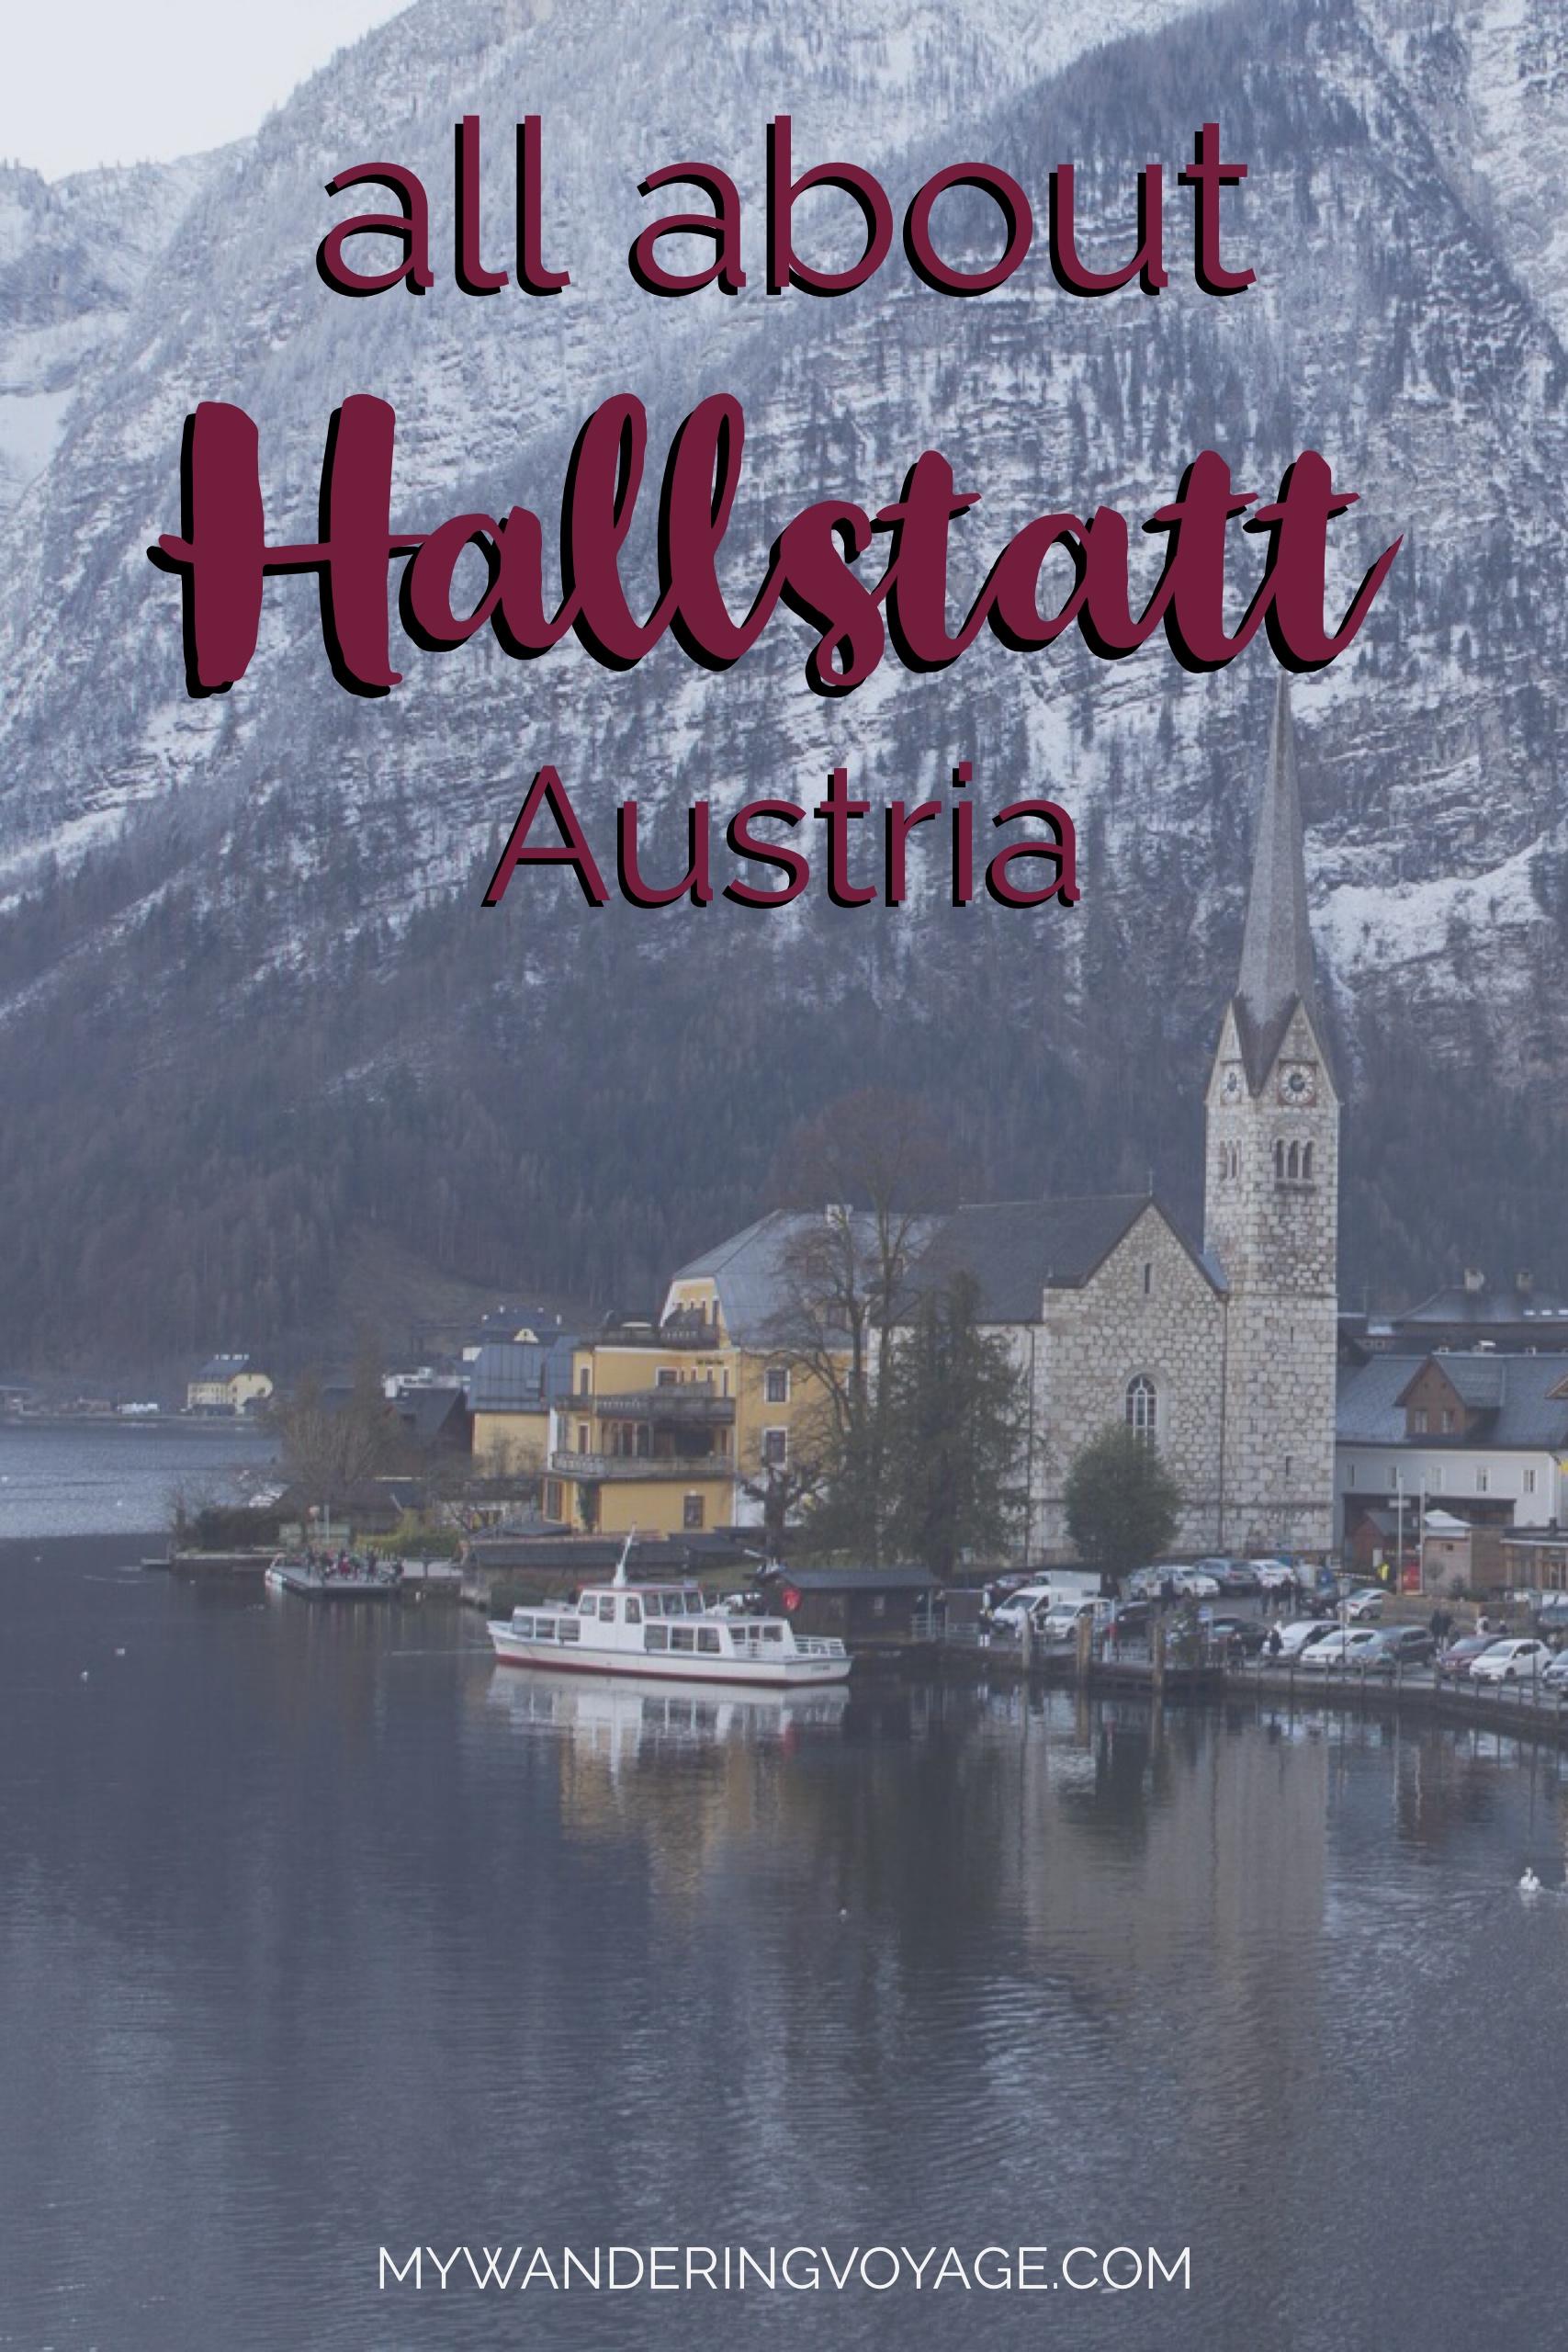 All About Hallstatt, Austria